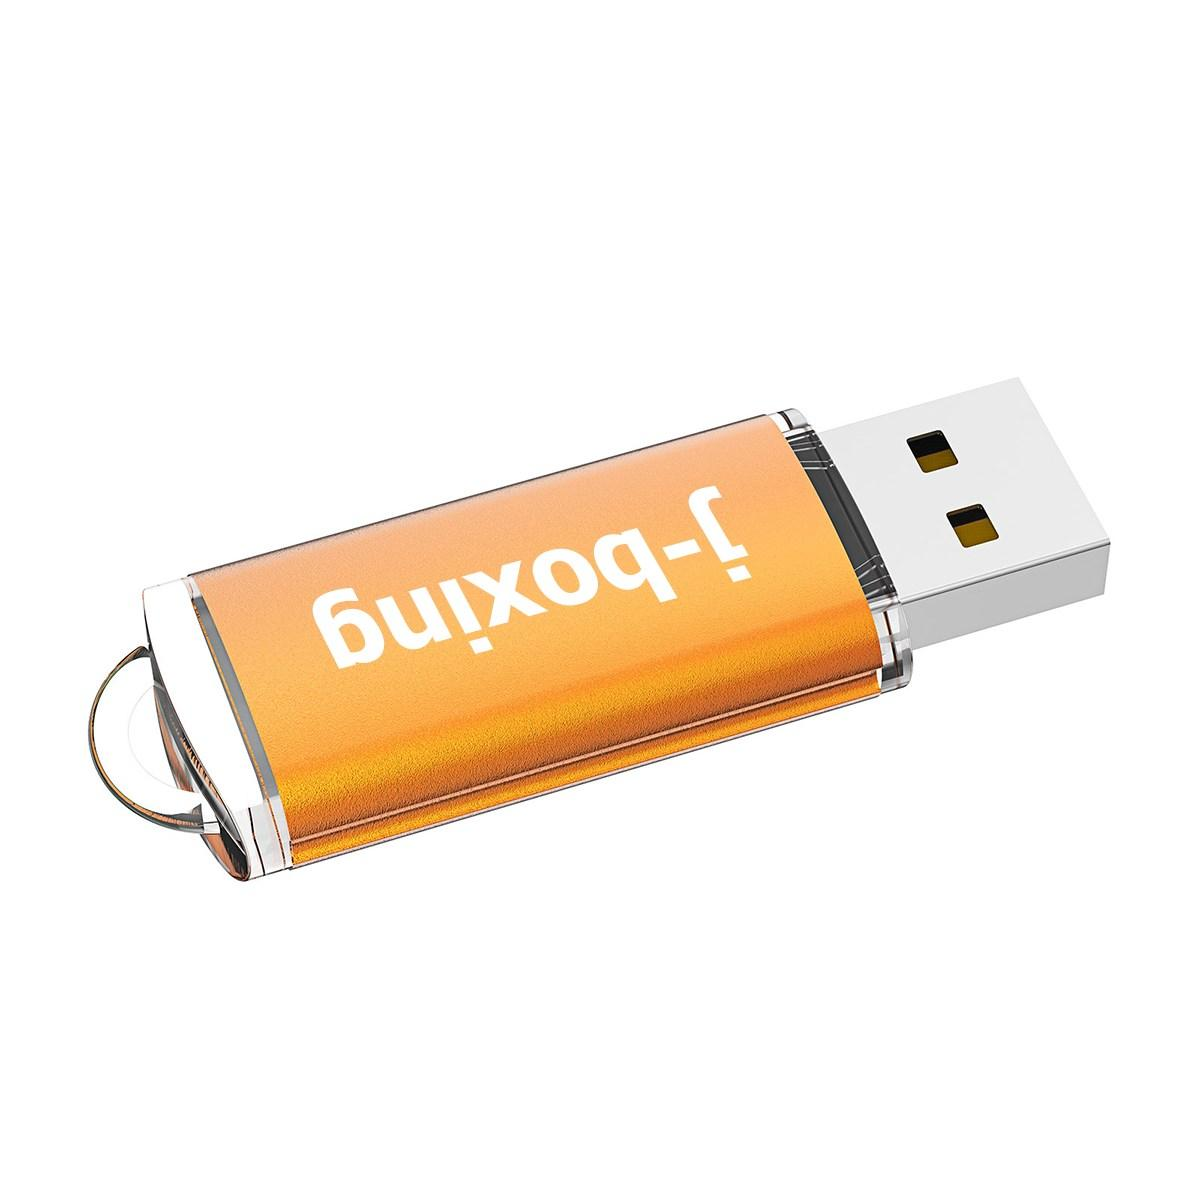 Turuncu Toplu 200PCS 256MB USB 2.0 Flash Sürücü Dikdörtgen Thumb Kalem Bilgisayar Dizüstü Tablet Macbook U Disk Flash Memory Stick Depolama Sürücüler